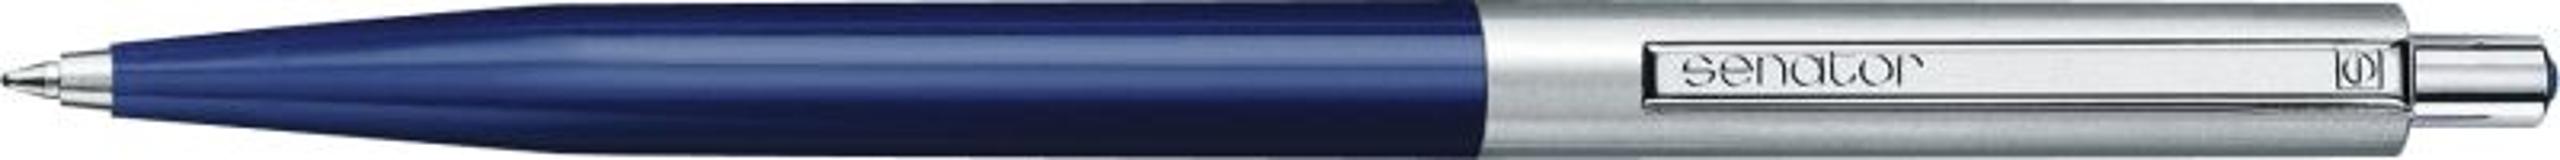 Ручка металлическая Point Polished Metal, синий фото